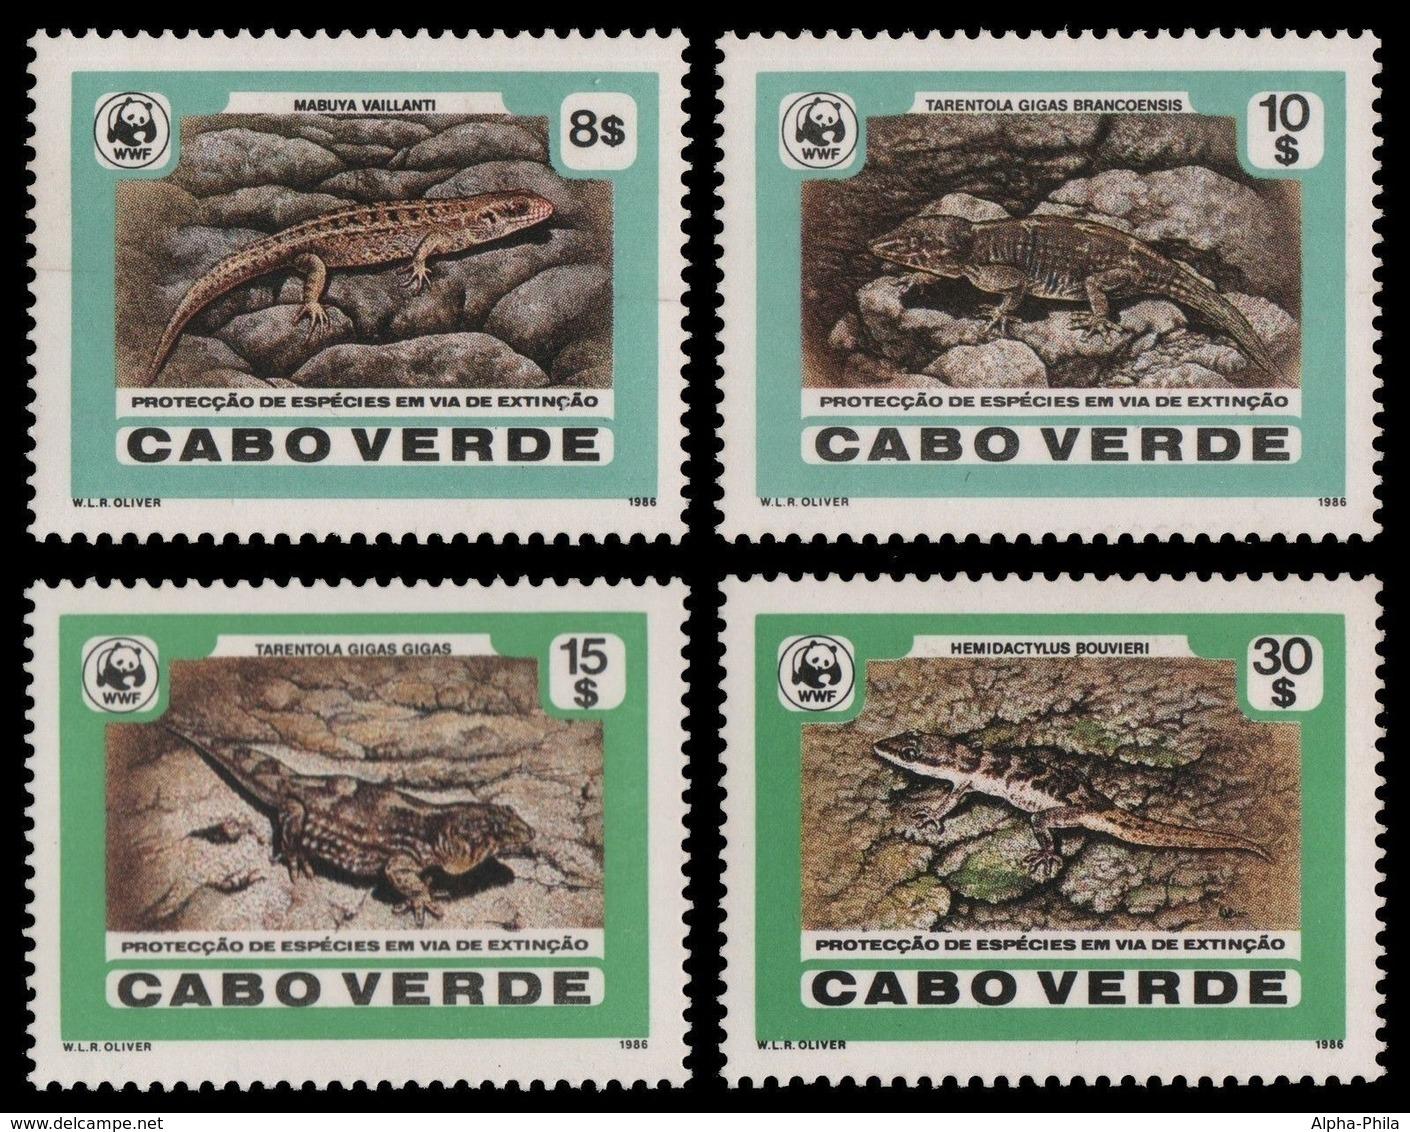 Kap Verde 1986 - Mi-Nr. 500-503 ** - MNH - Reptilien / Reptiles - Isola Di Capo Verde